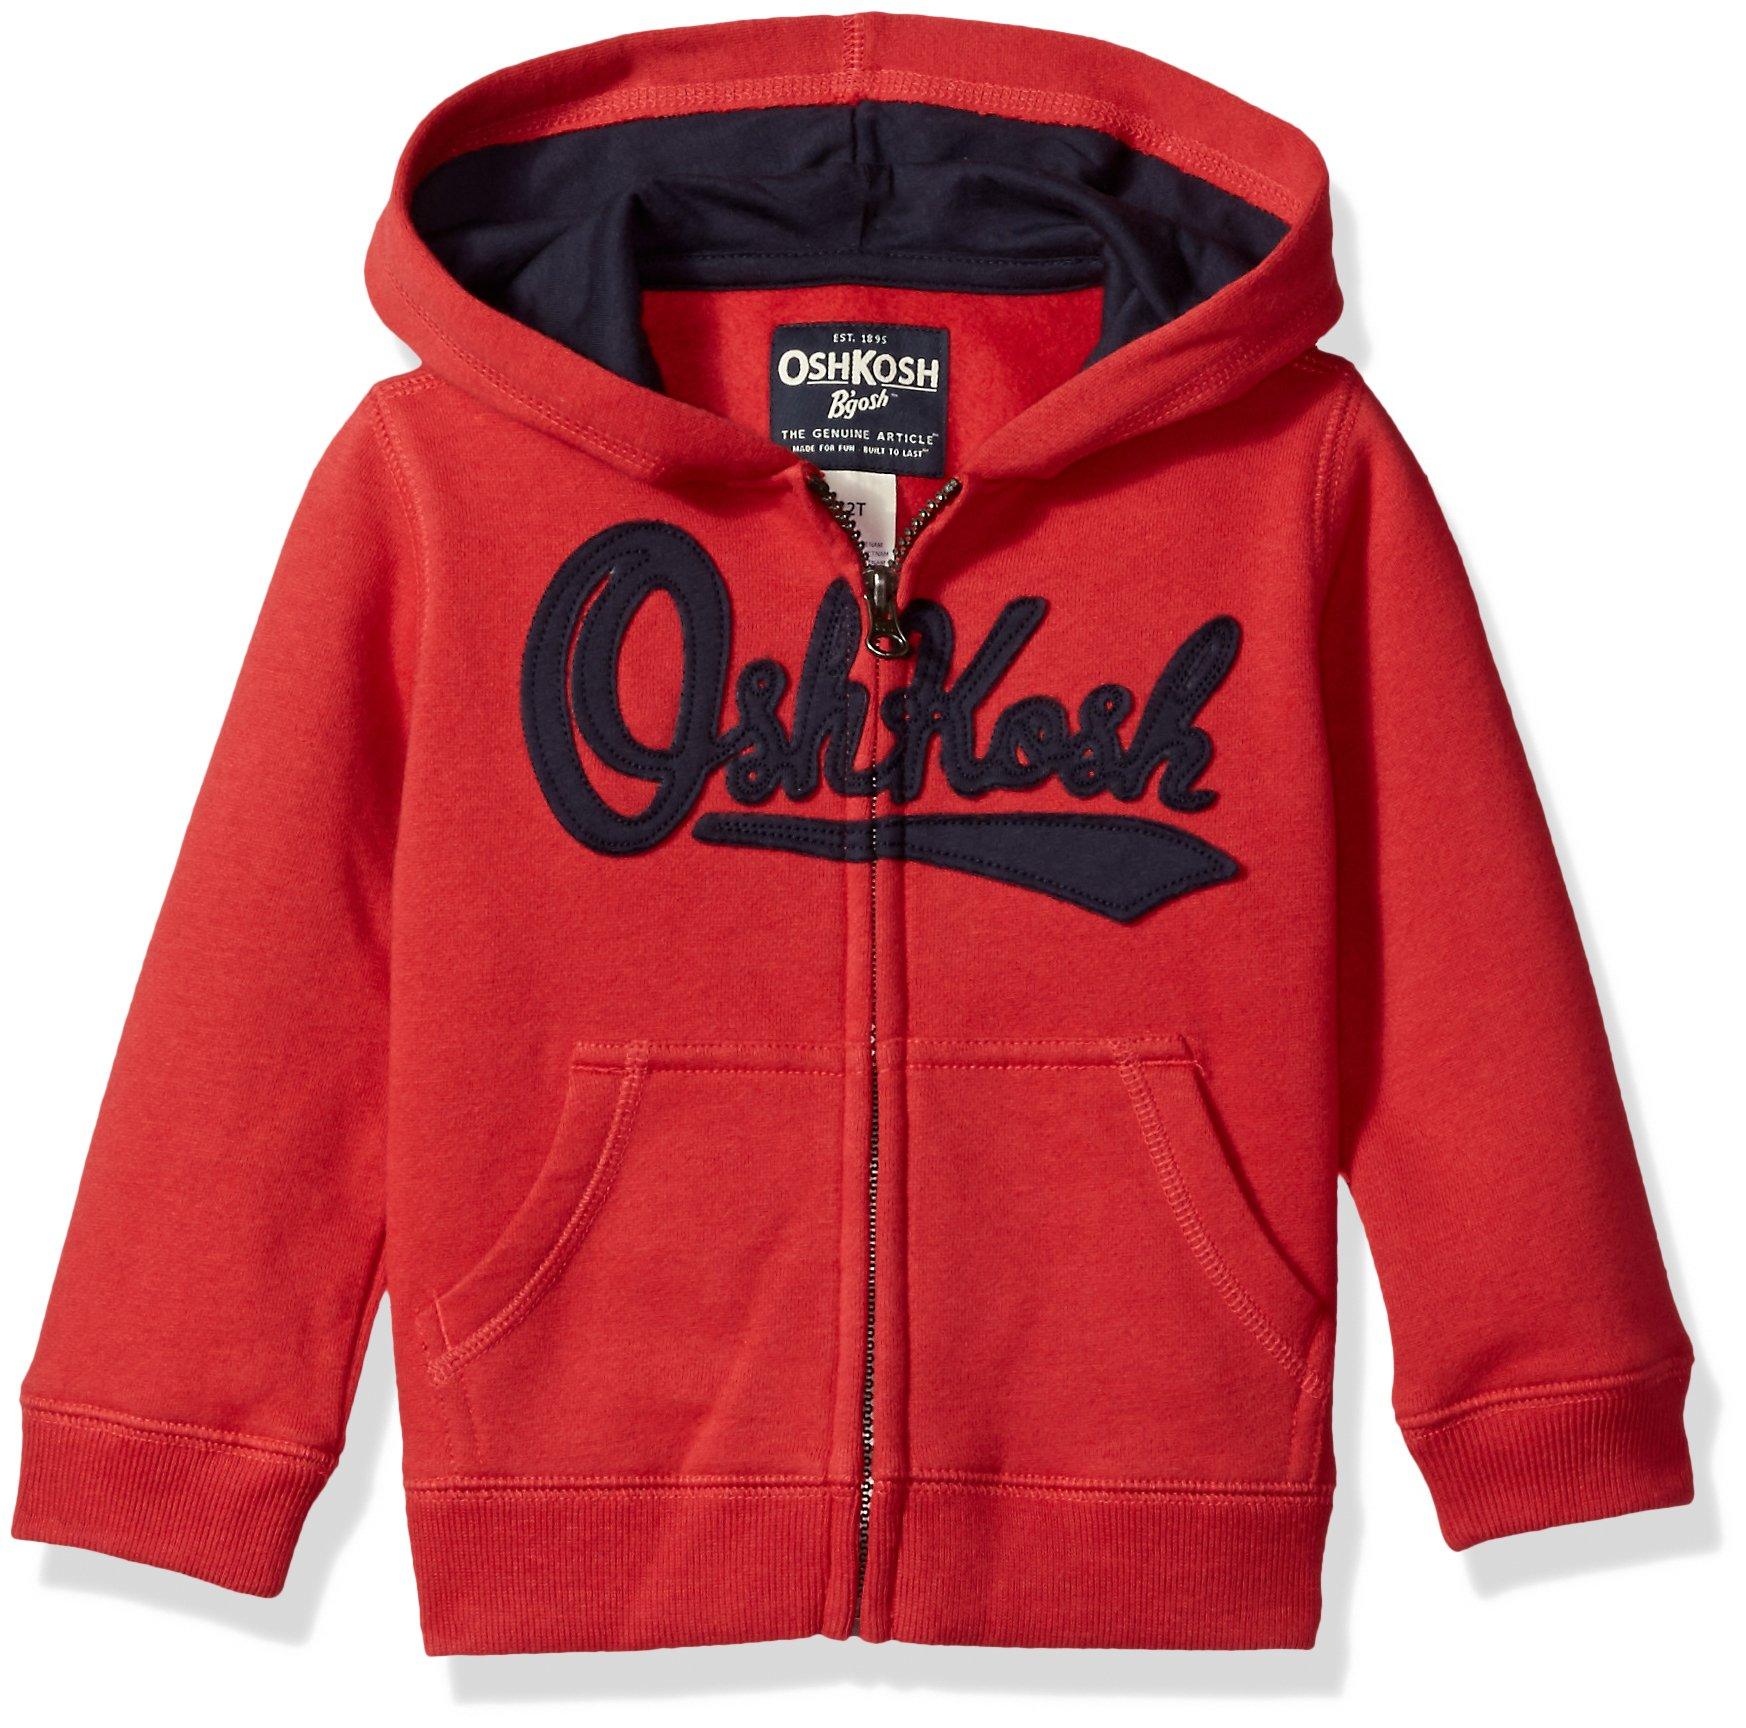 OshKosh B'Gosh Boys' Toddler Full Zip Logo Hoodie, red, 2T